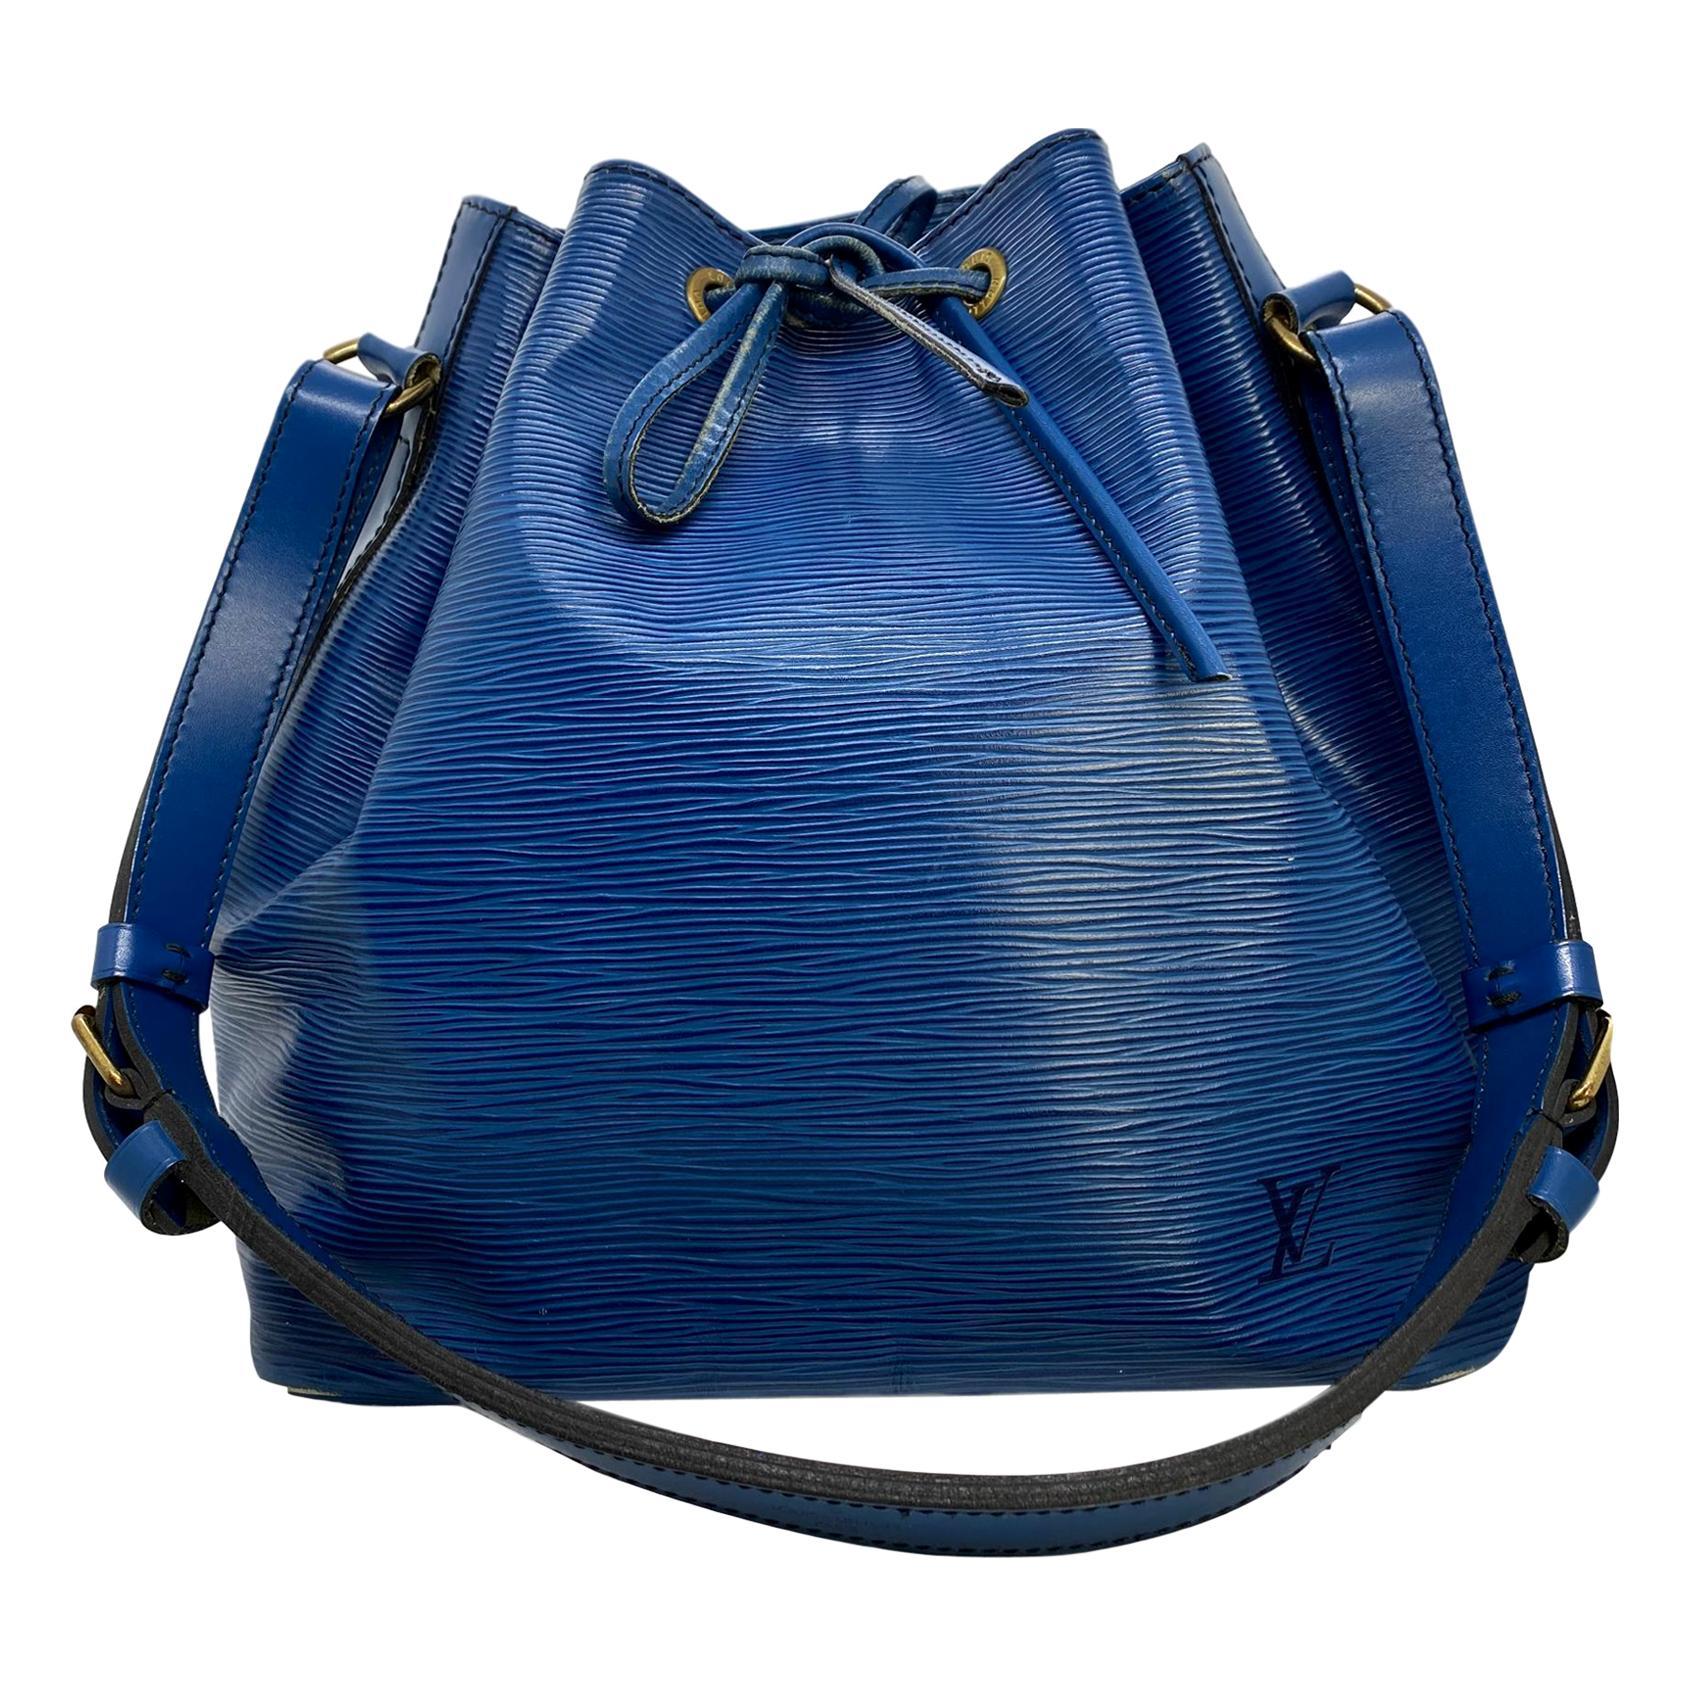 Louis Vuitton Noe PM Bucket Bag in Toledo Blue EPI Leather, France 1995.